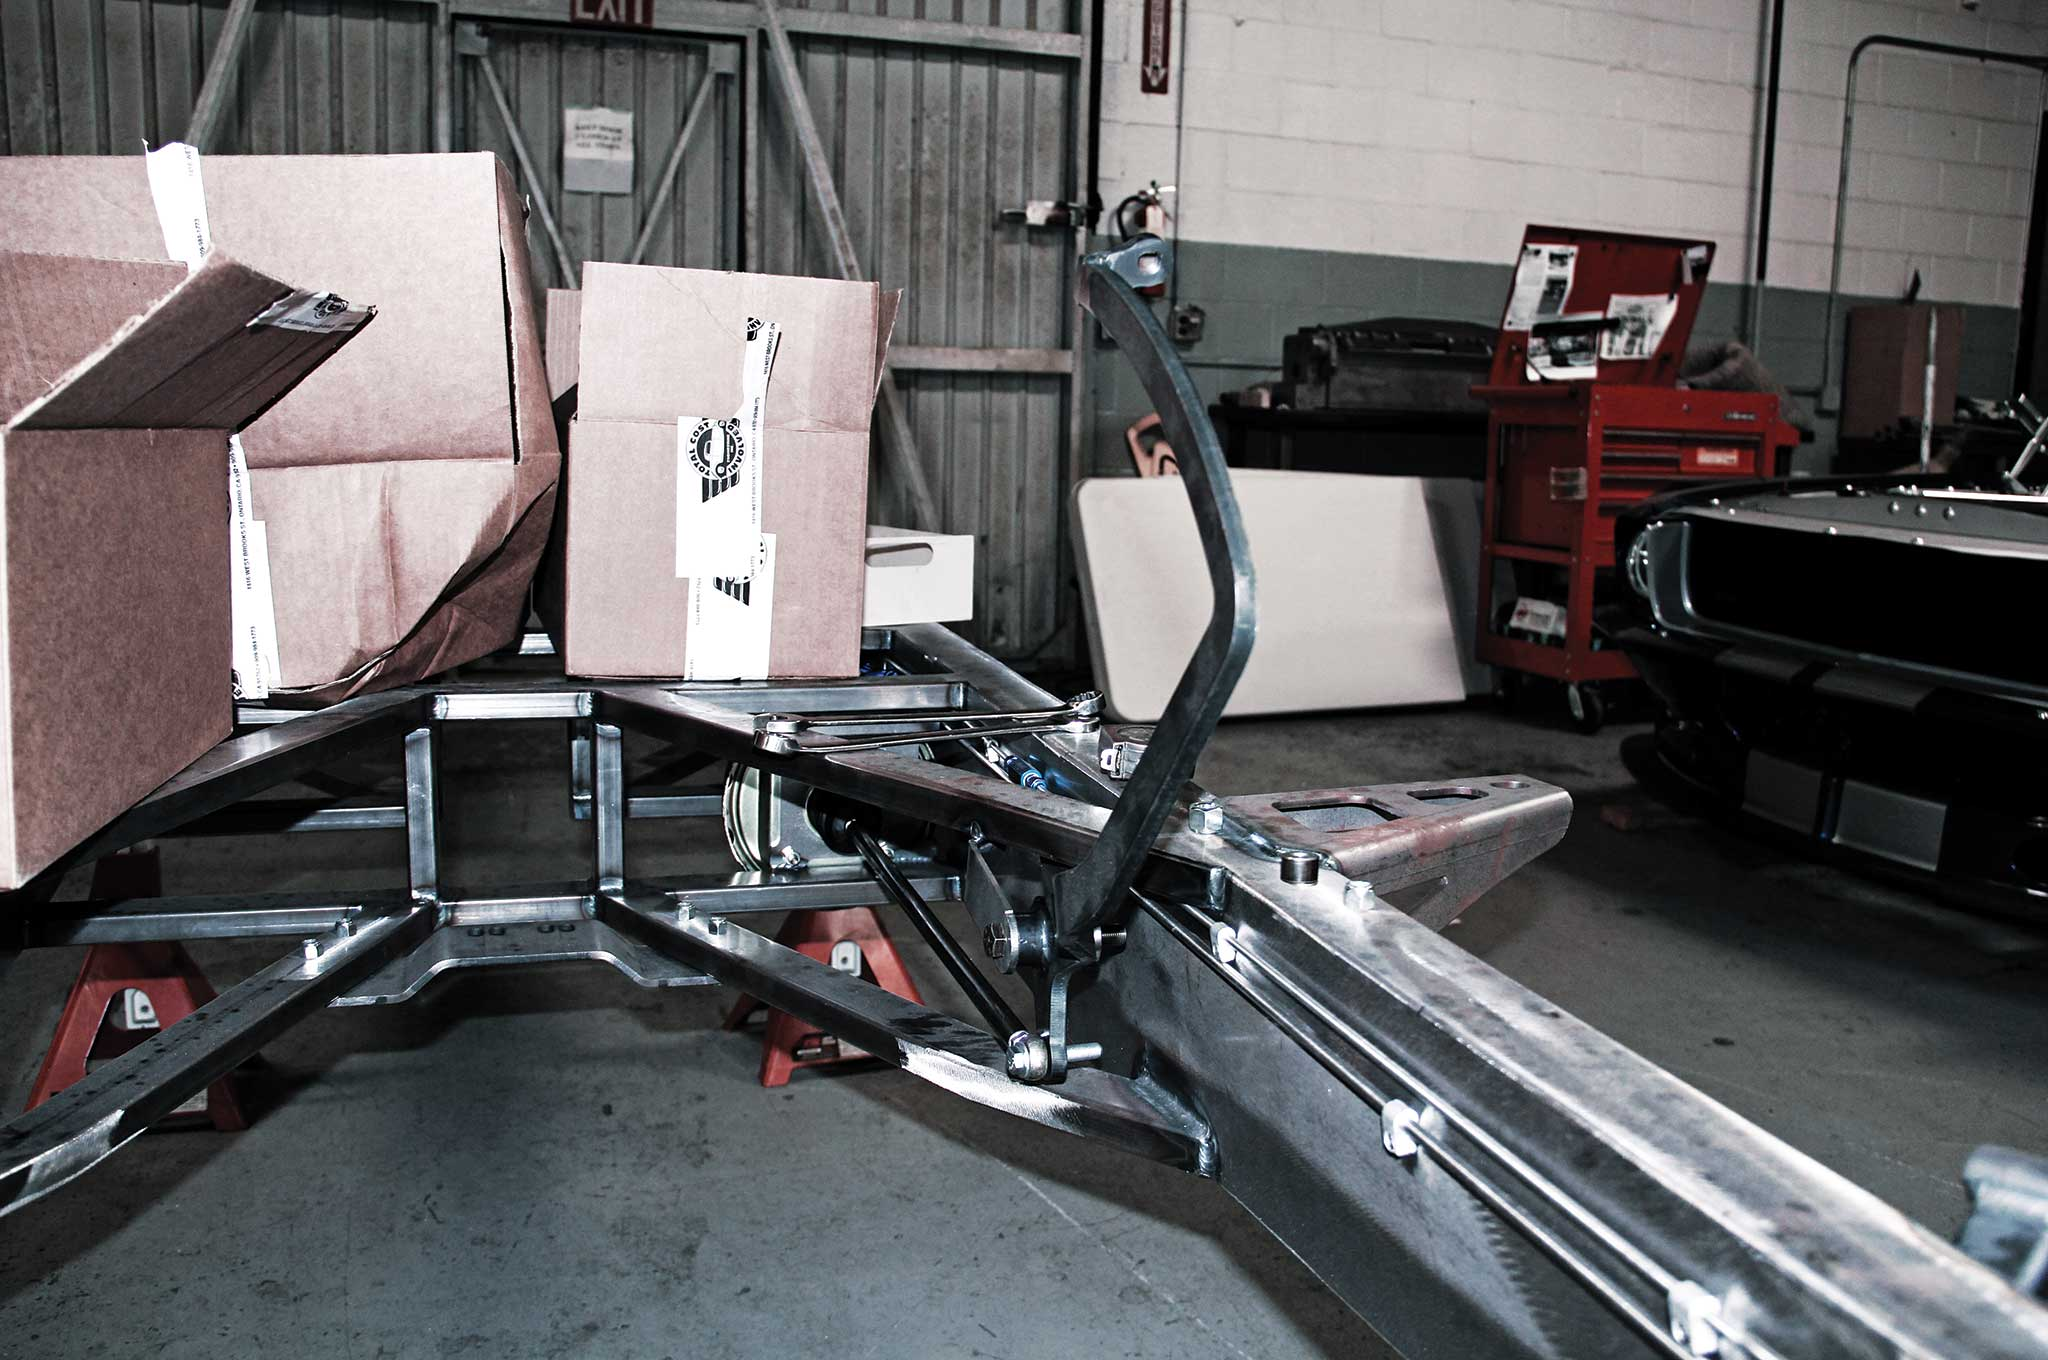 003 assembling a tci truck frame foot brake pedal bracket install